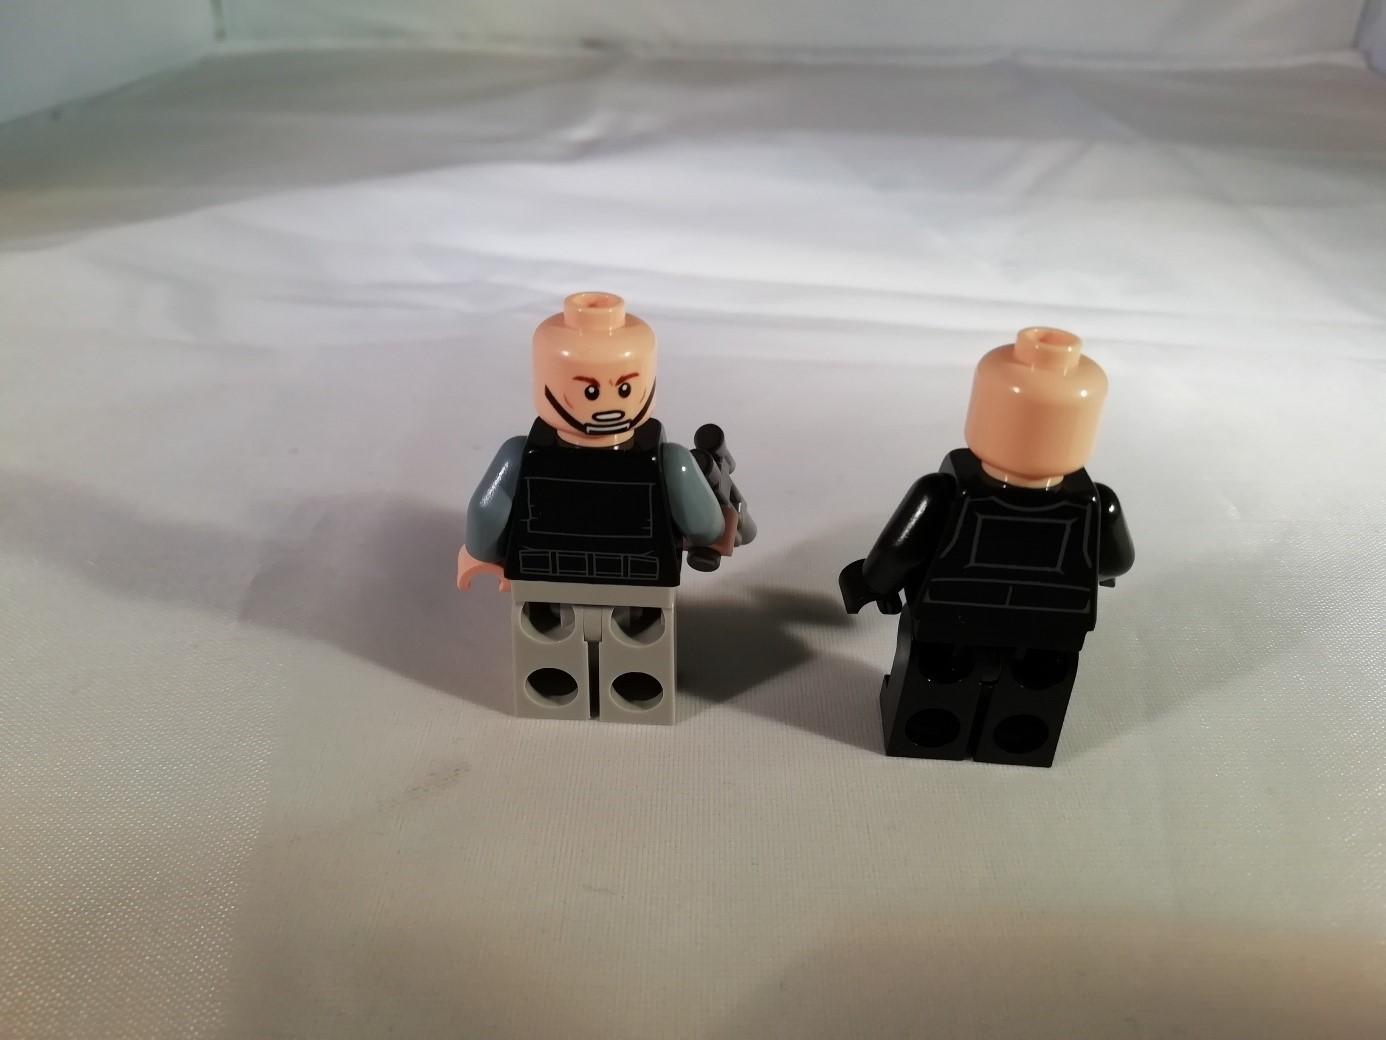 Beide Figuren ohne Kopfbedeckung